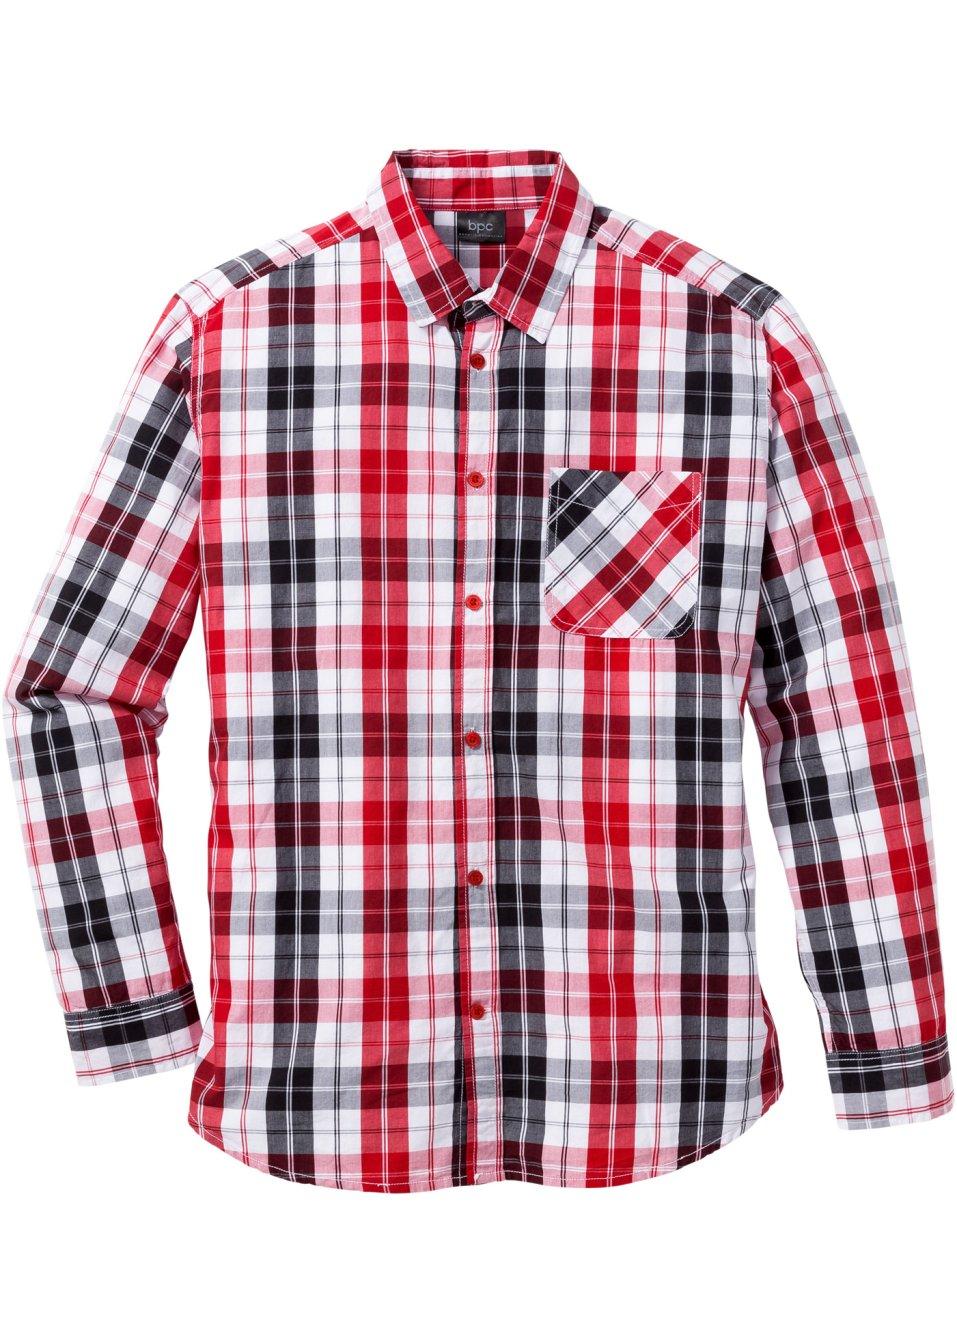 kariertes lang rmliges hemd im sportlichen look rot schwarz wei kariert. Black Bedroom Furniture Sets. Home Design Ideas